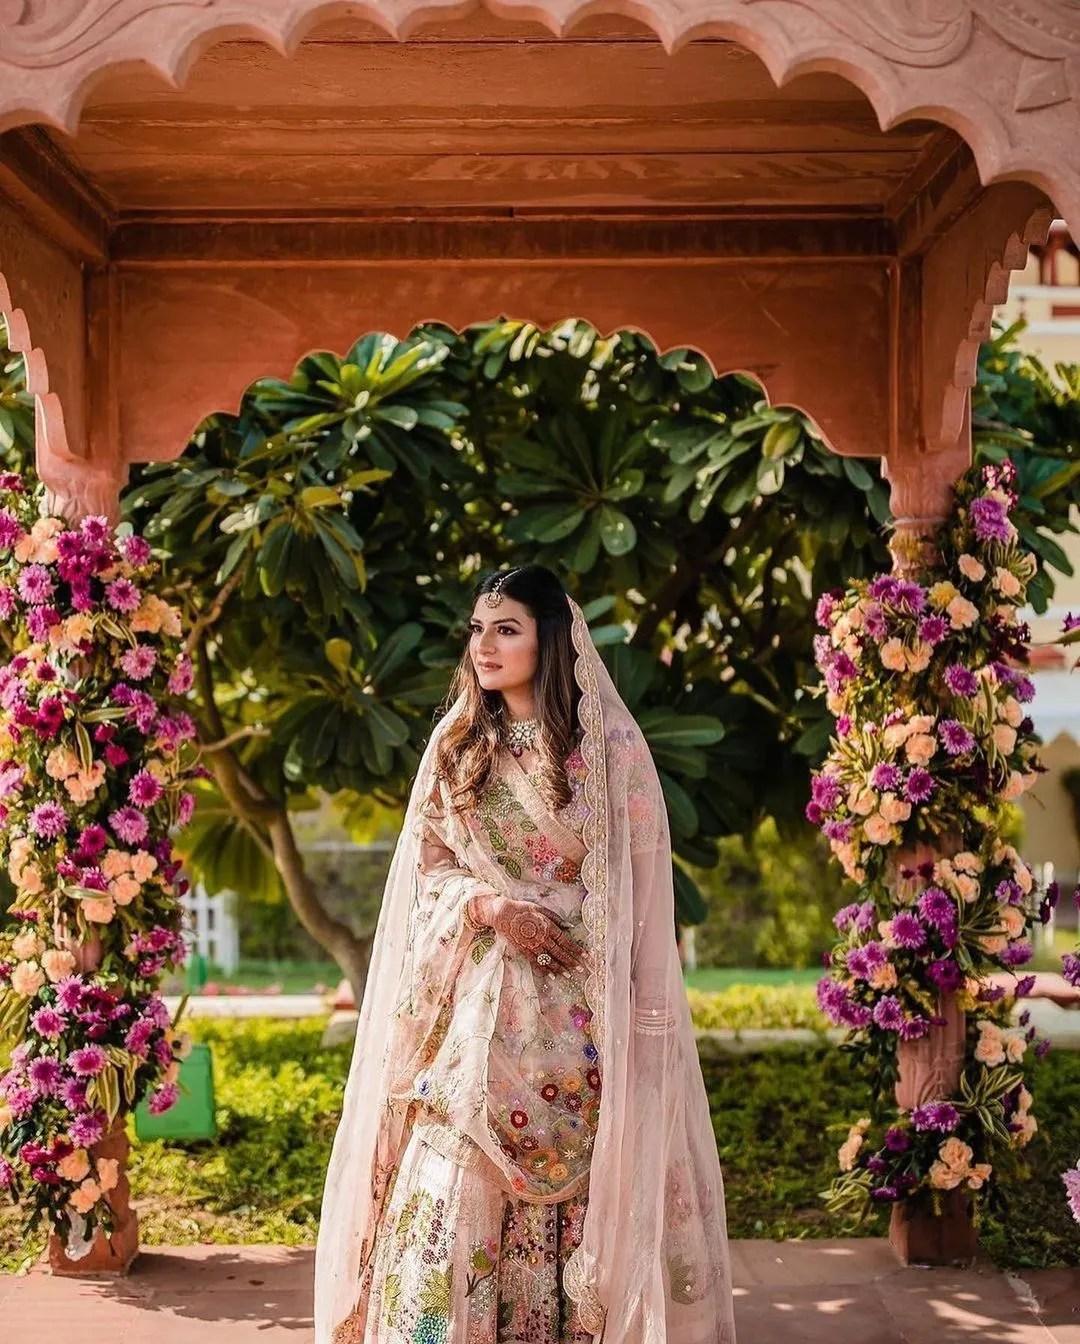 Rahul Mishra's Bridal collection